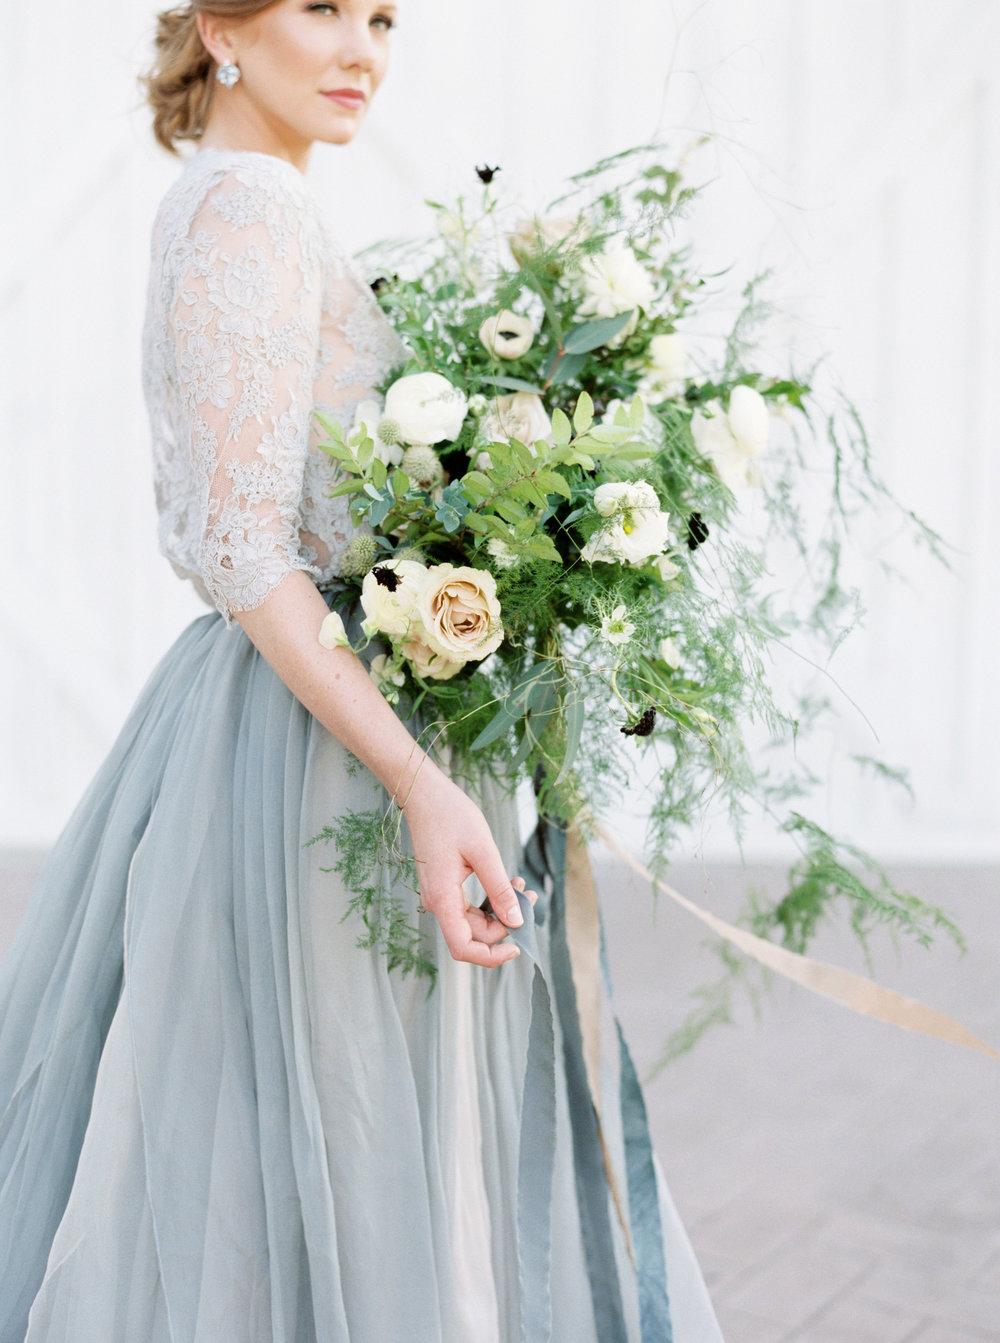 Bride-0072.jpg